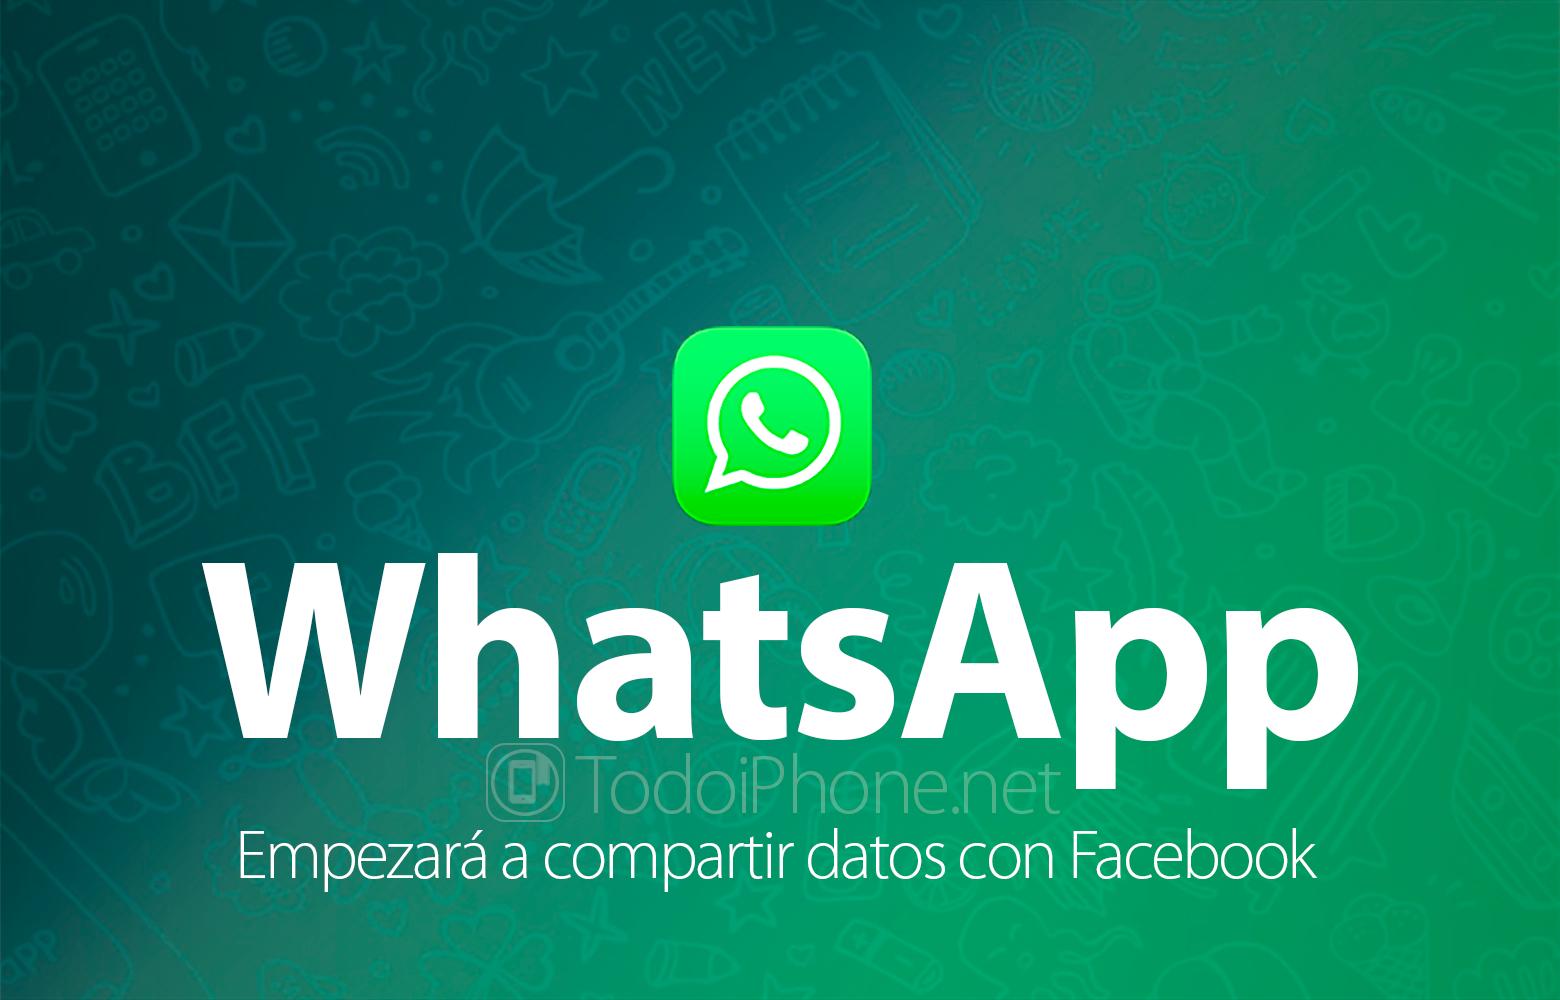 WhatsApp will start sharing user data with Facebook 1